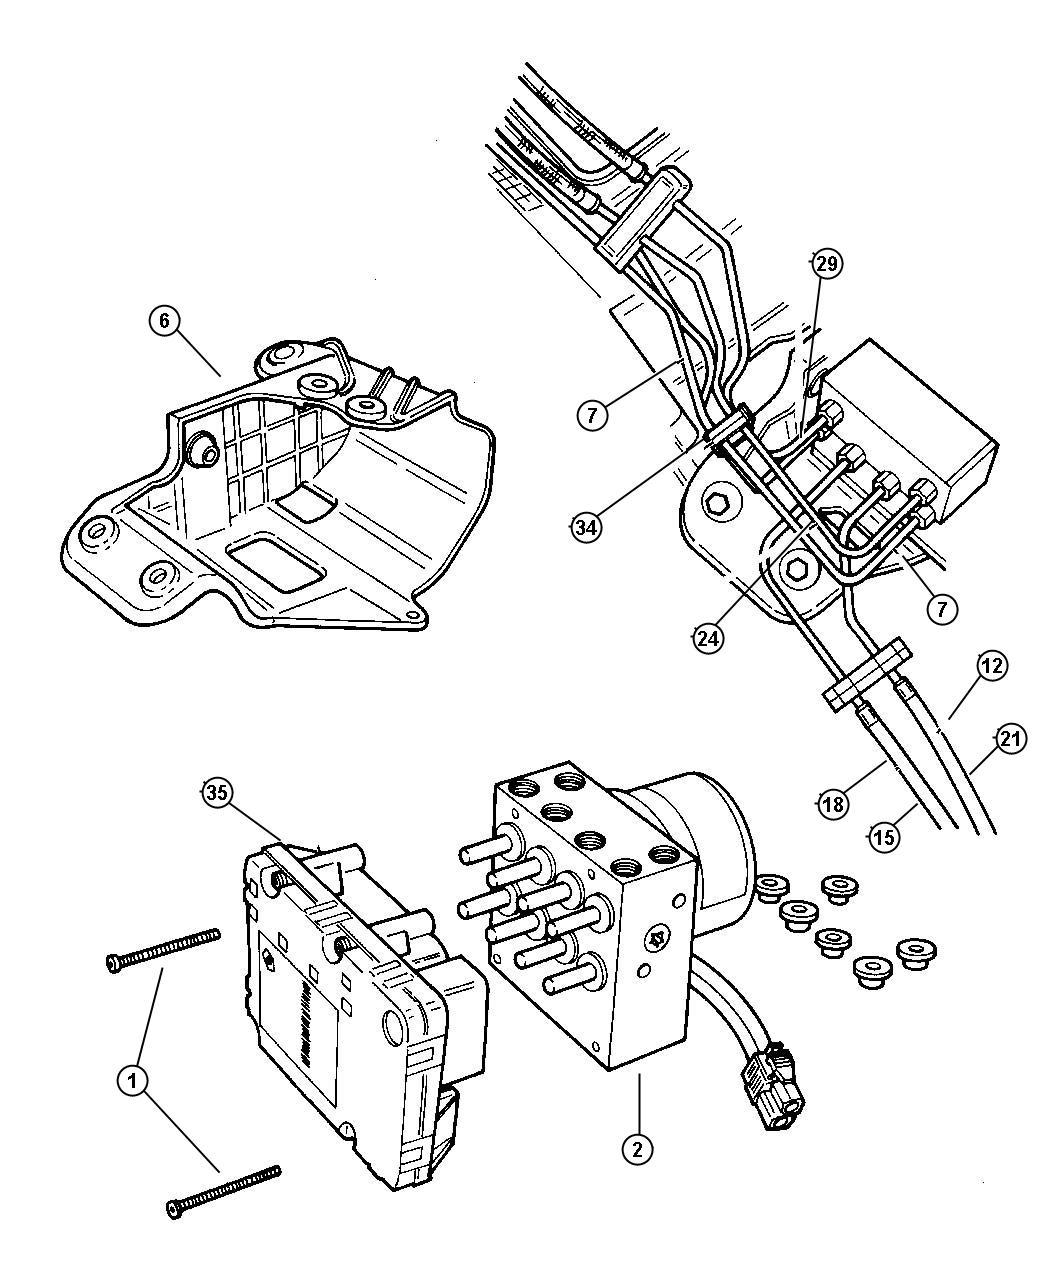 1998 Dodge Caravan Tube. Brake, junction block to valve